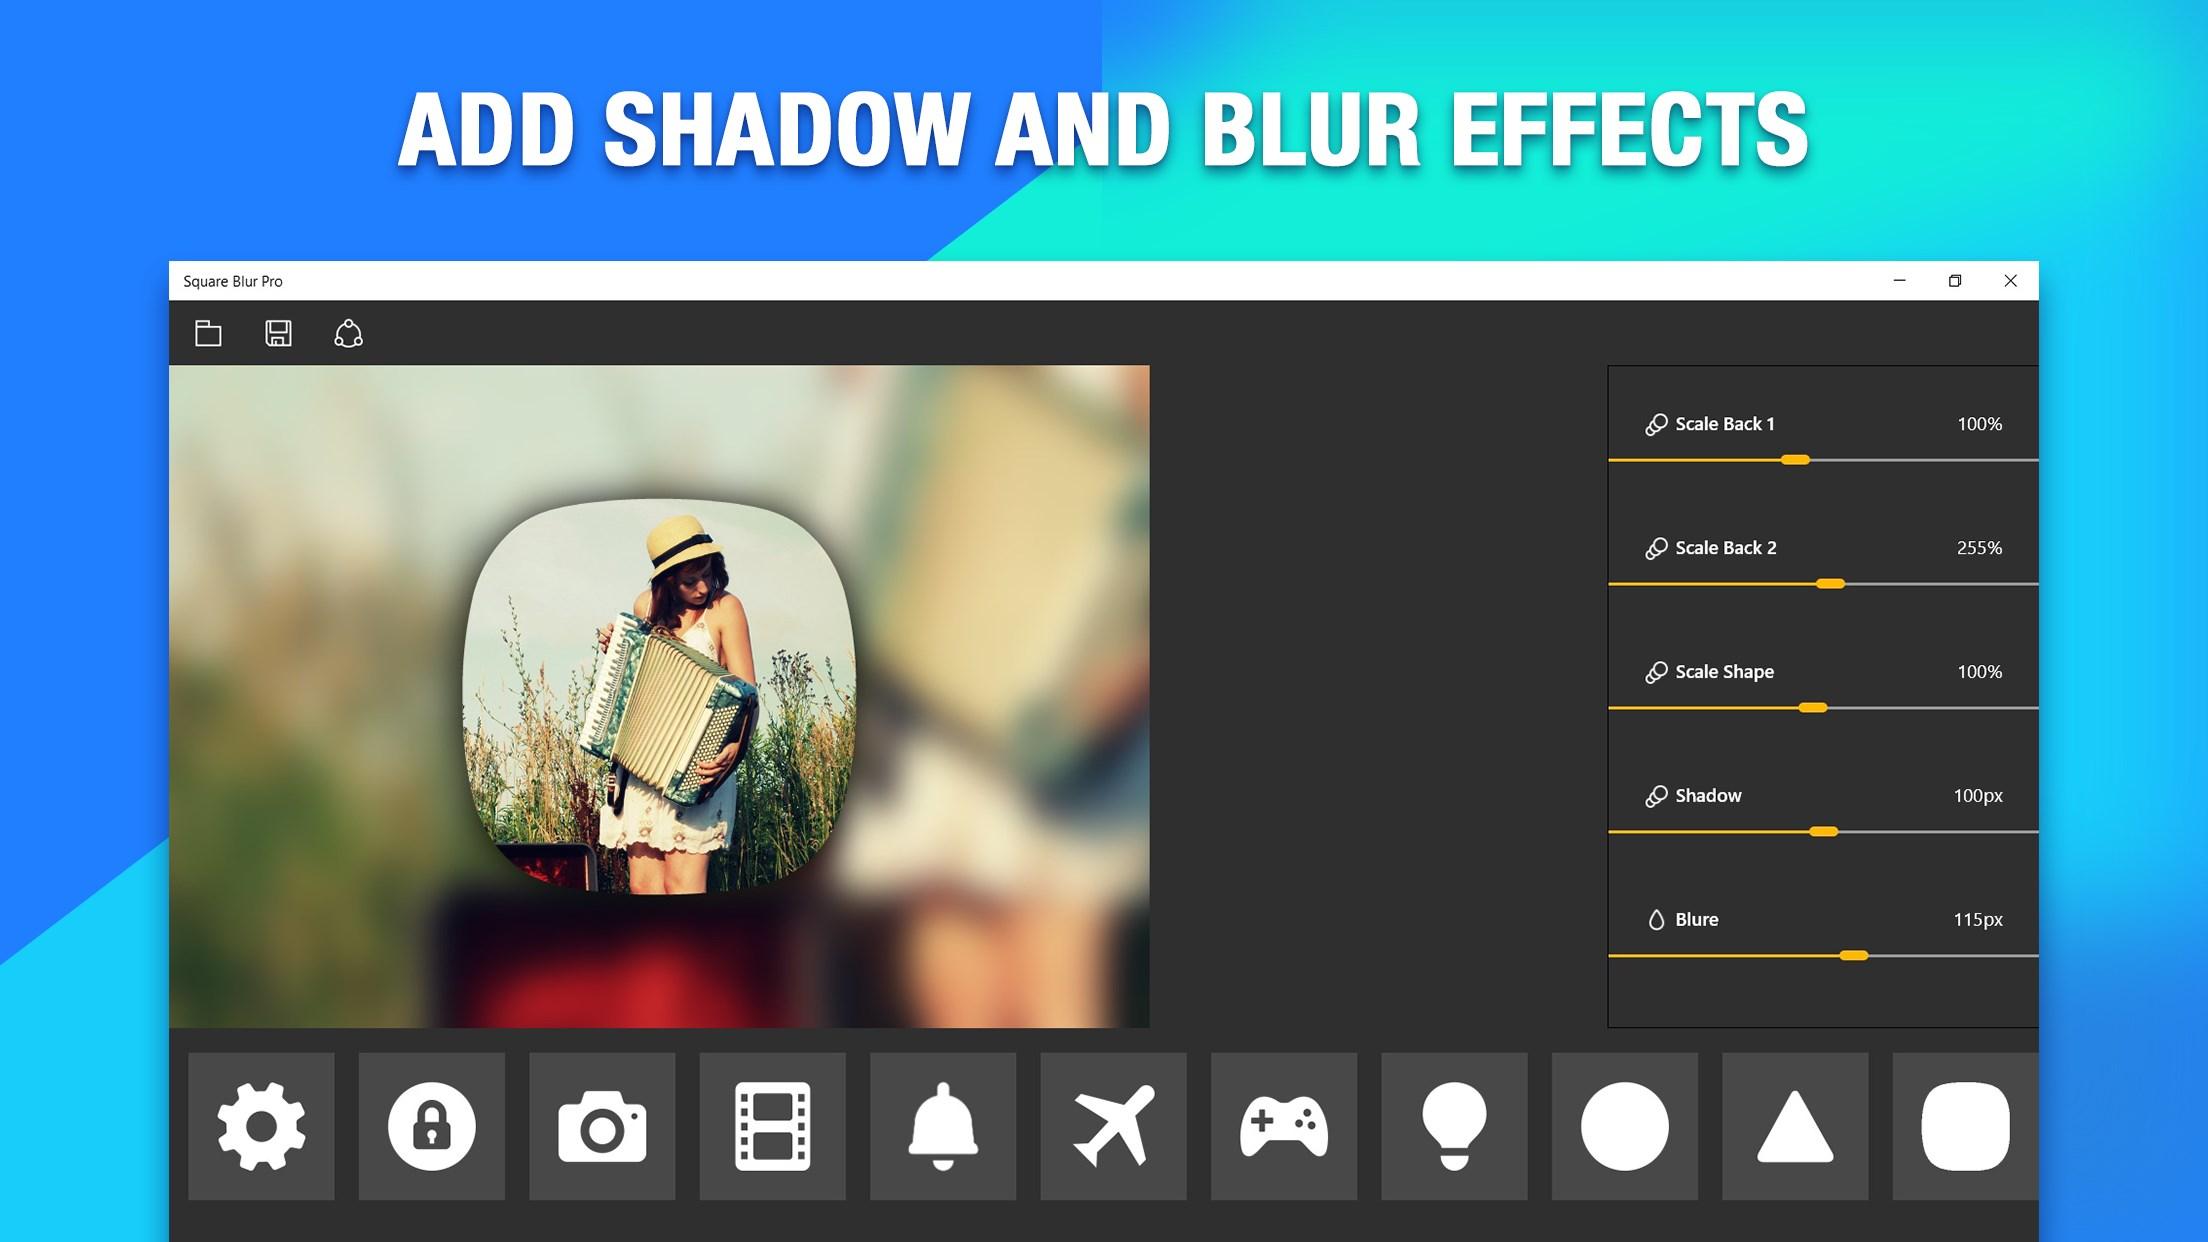 Square Blur Pro